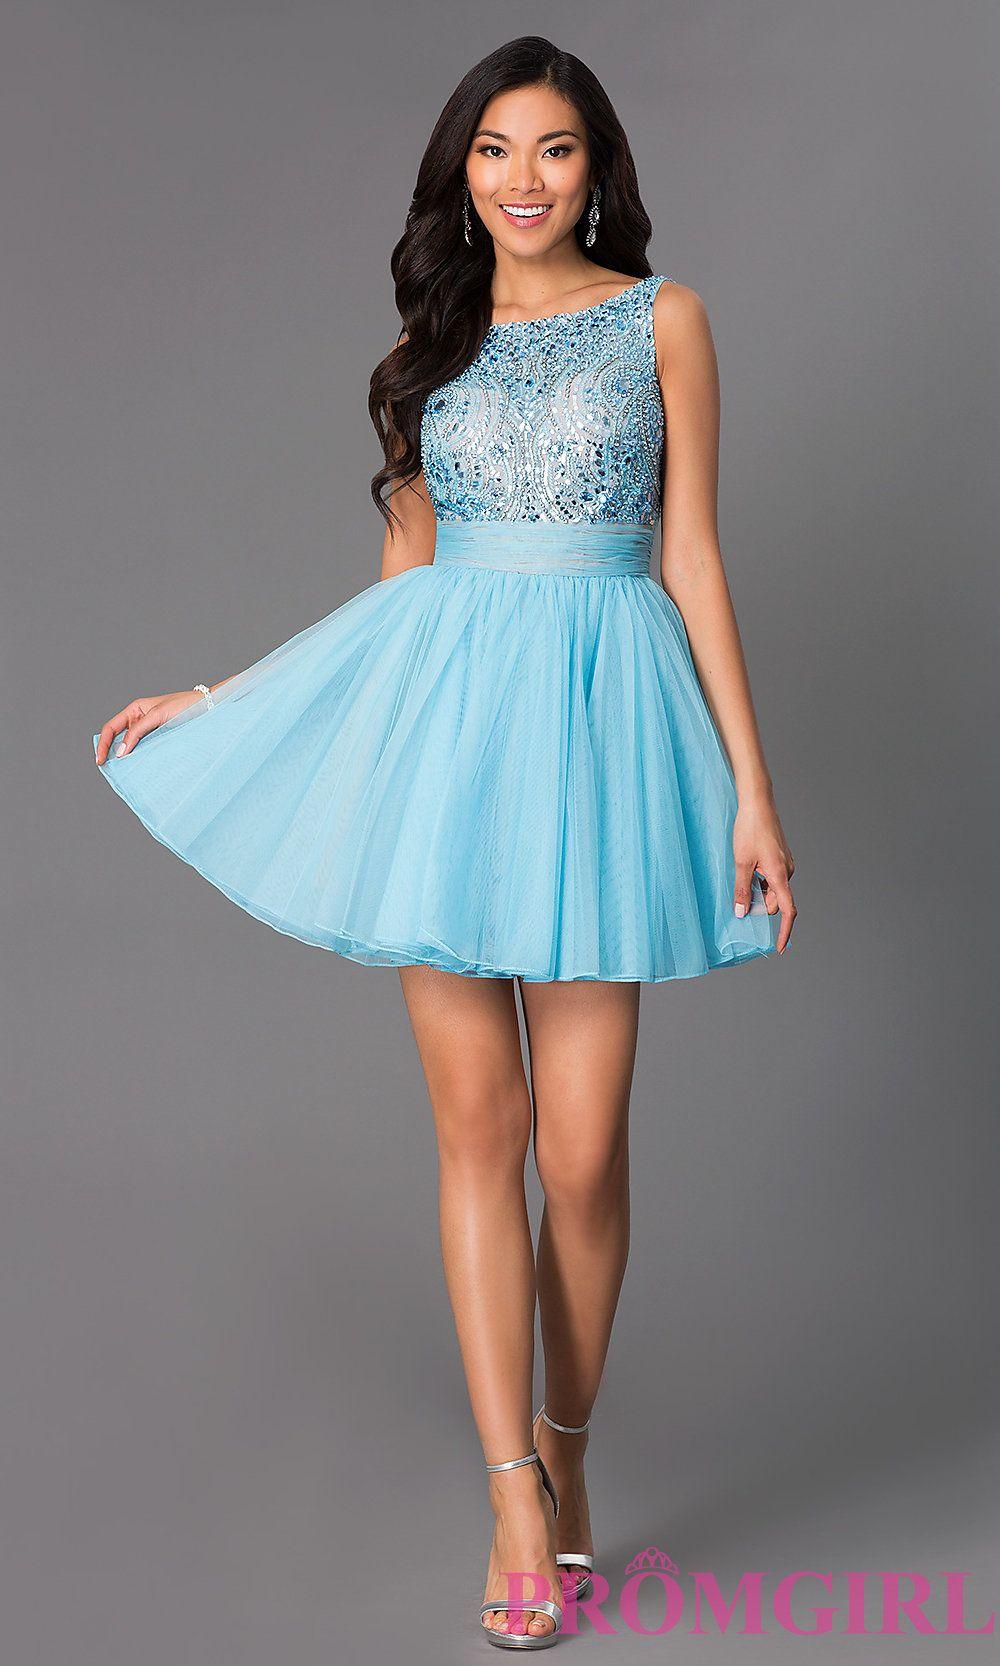 Gorgeous beaded short dress in light blue by sherri hill dress